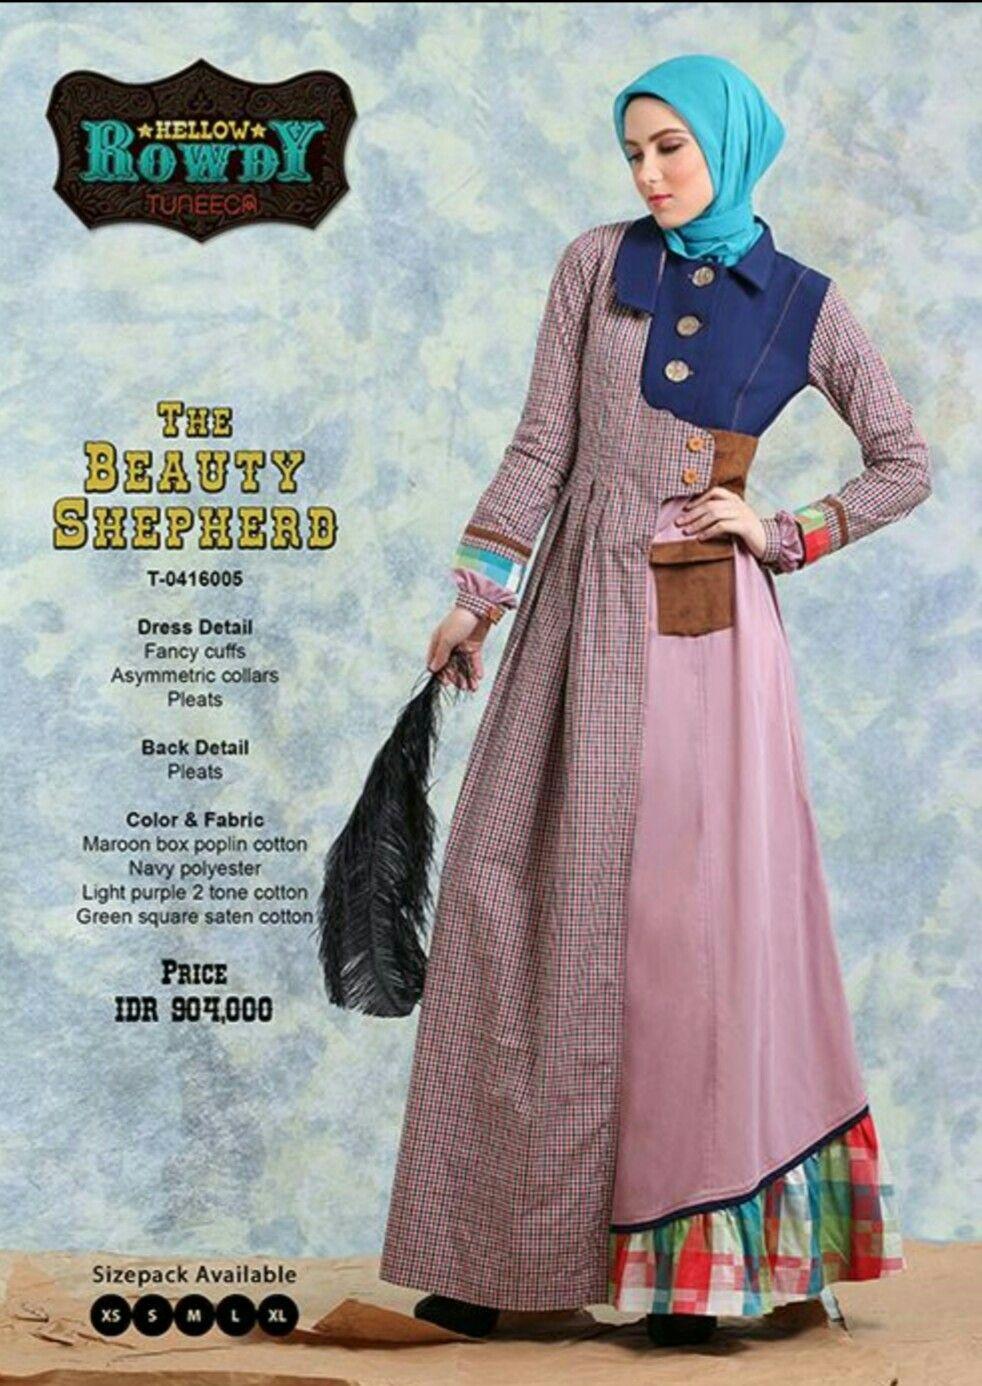 Tuneeca hr12.12  Pakaian wanita, Model baju wanita, Model pakaian hijab